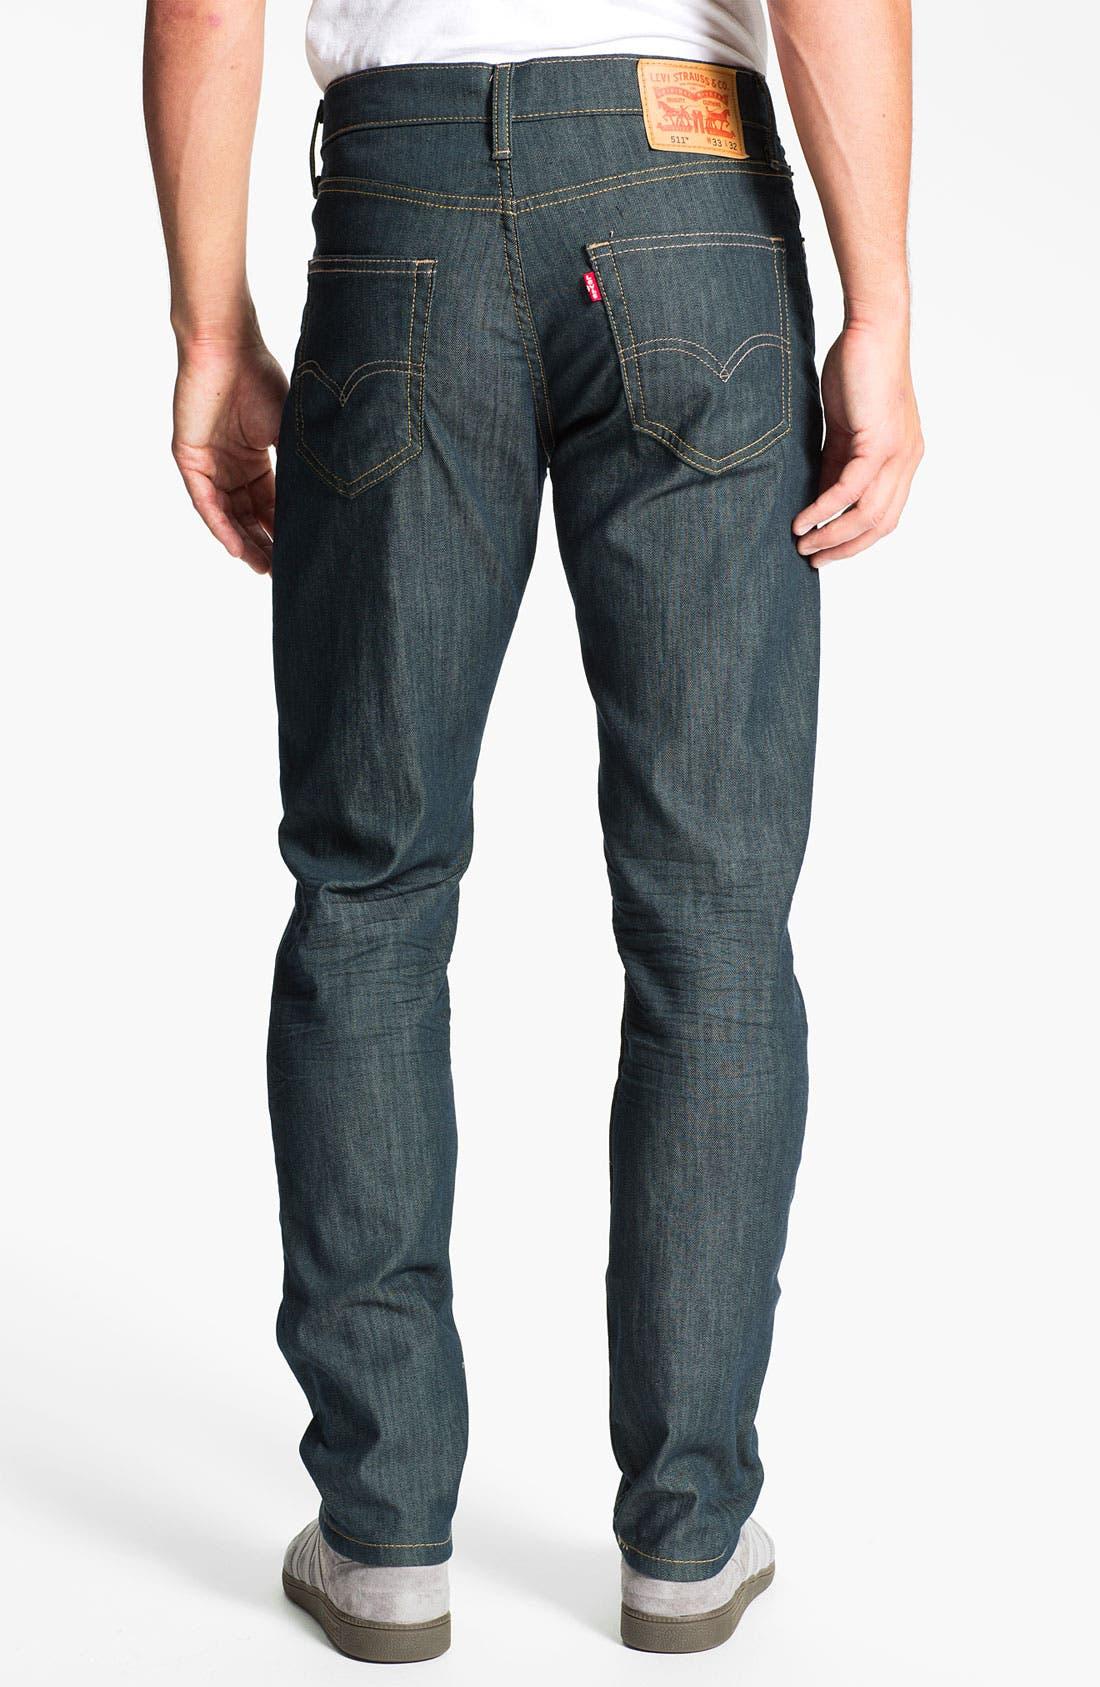 Alternate Image 1 Selected - Levi's® '511™' Skinny Leg Jeans (Rinsed Playa)